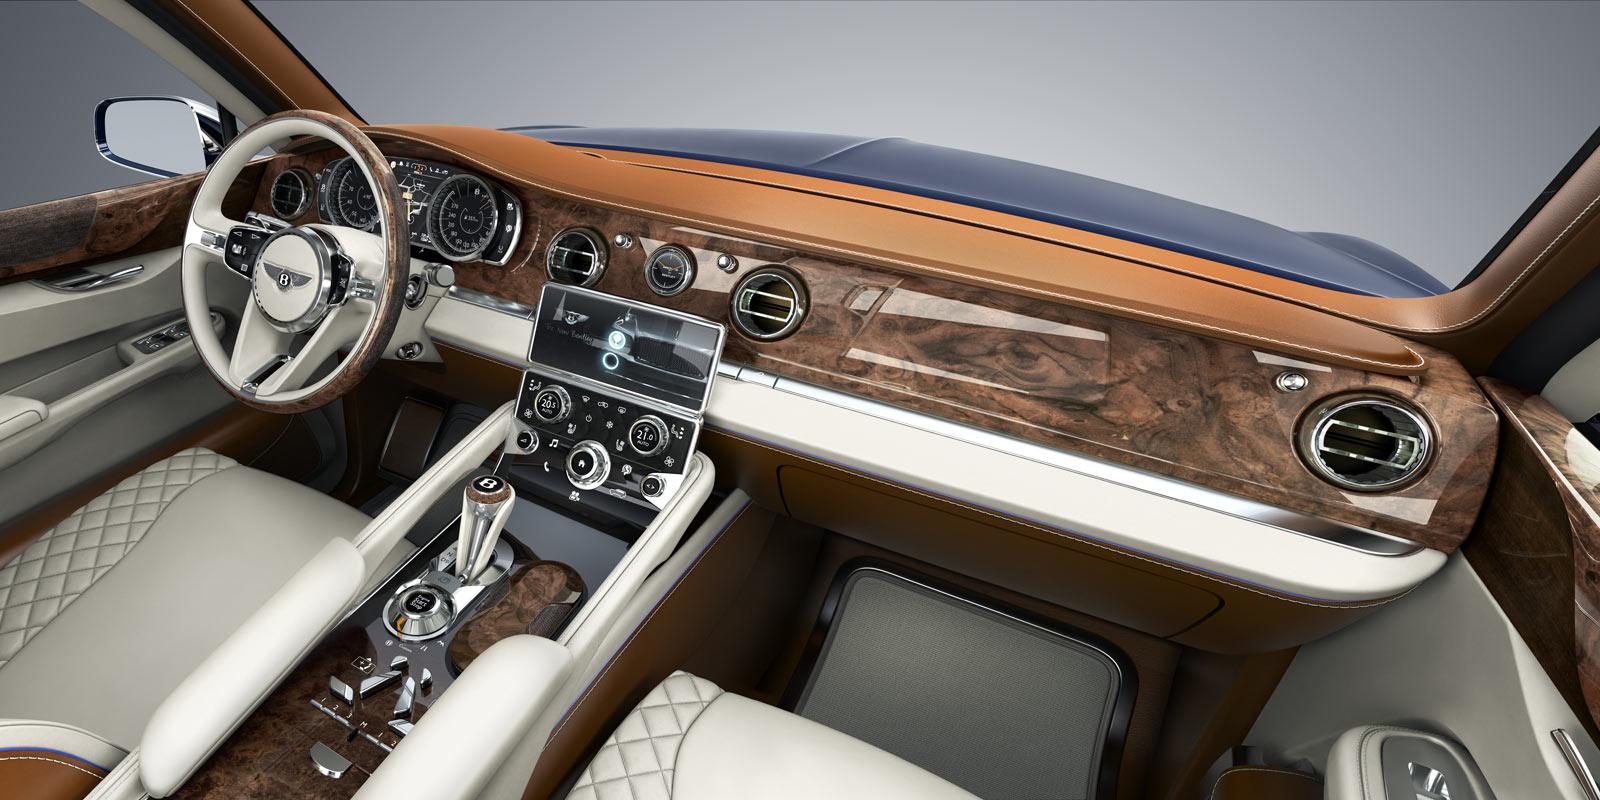 2012 bentley exp 9 f autokonzepte. Black Bedroom Furniture Sets. Home Design Ideas